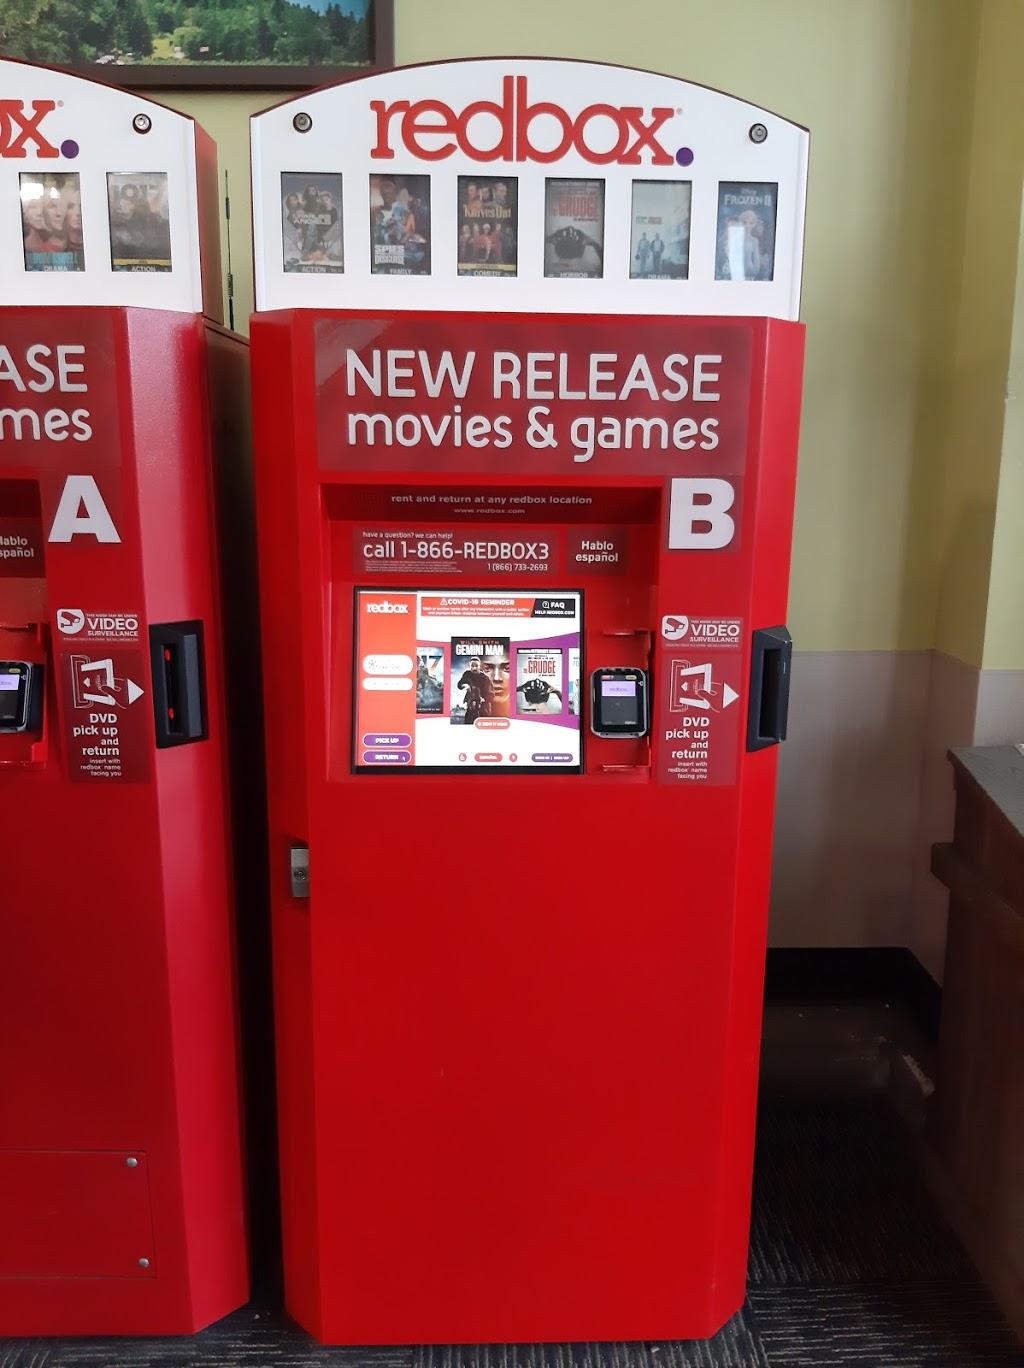 Redbox - movie rental  | Photo 2 of 2 | Address: 22855 NE Park Ln, Wood Village, OR 97060, USA | Phone: (866) 733-2693